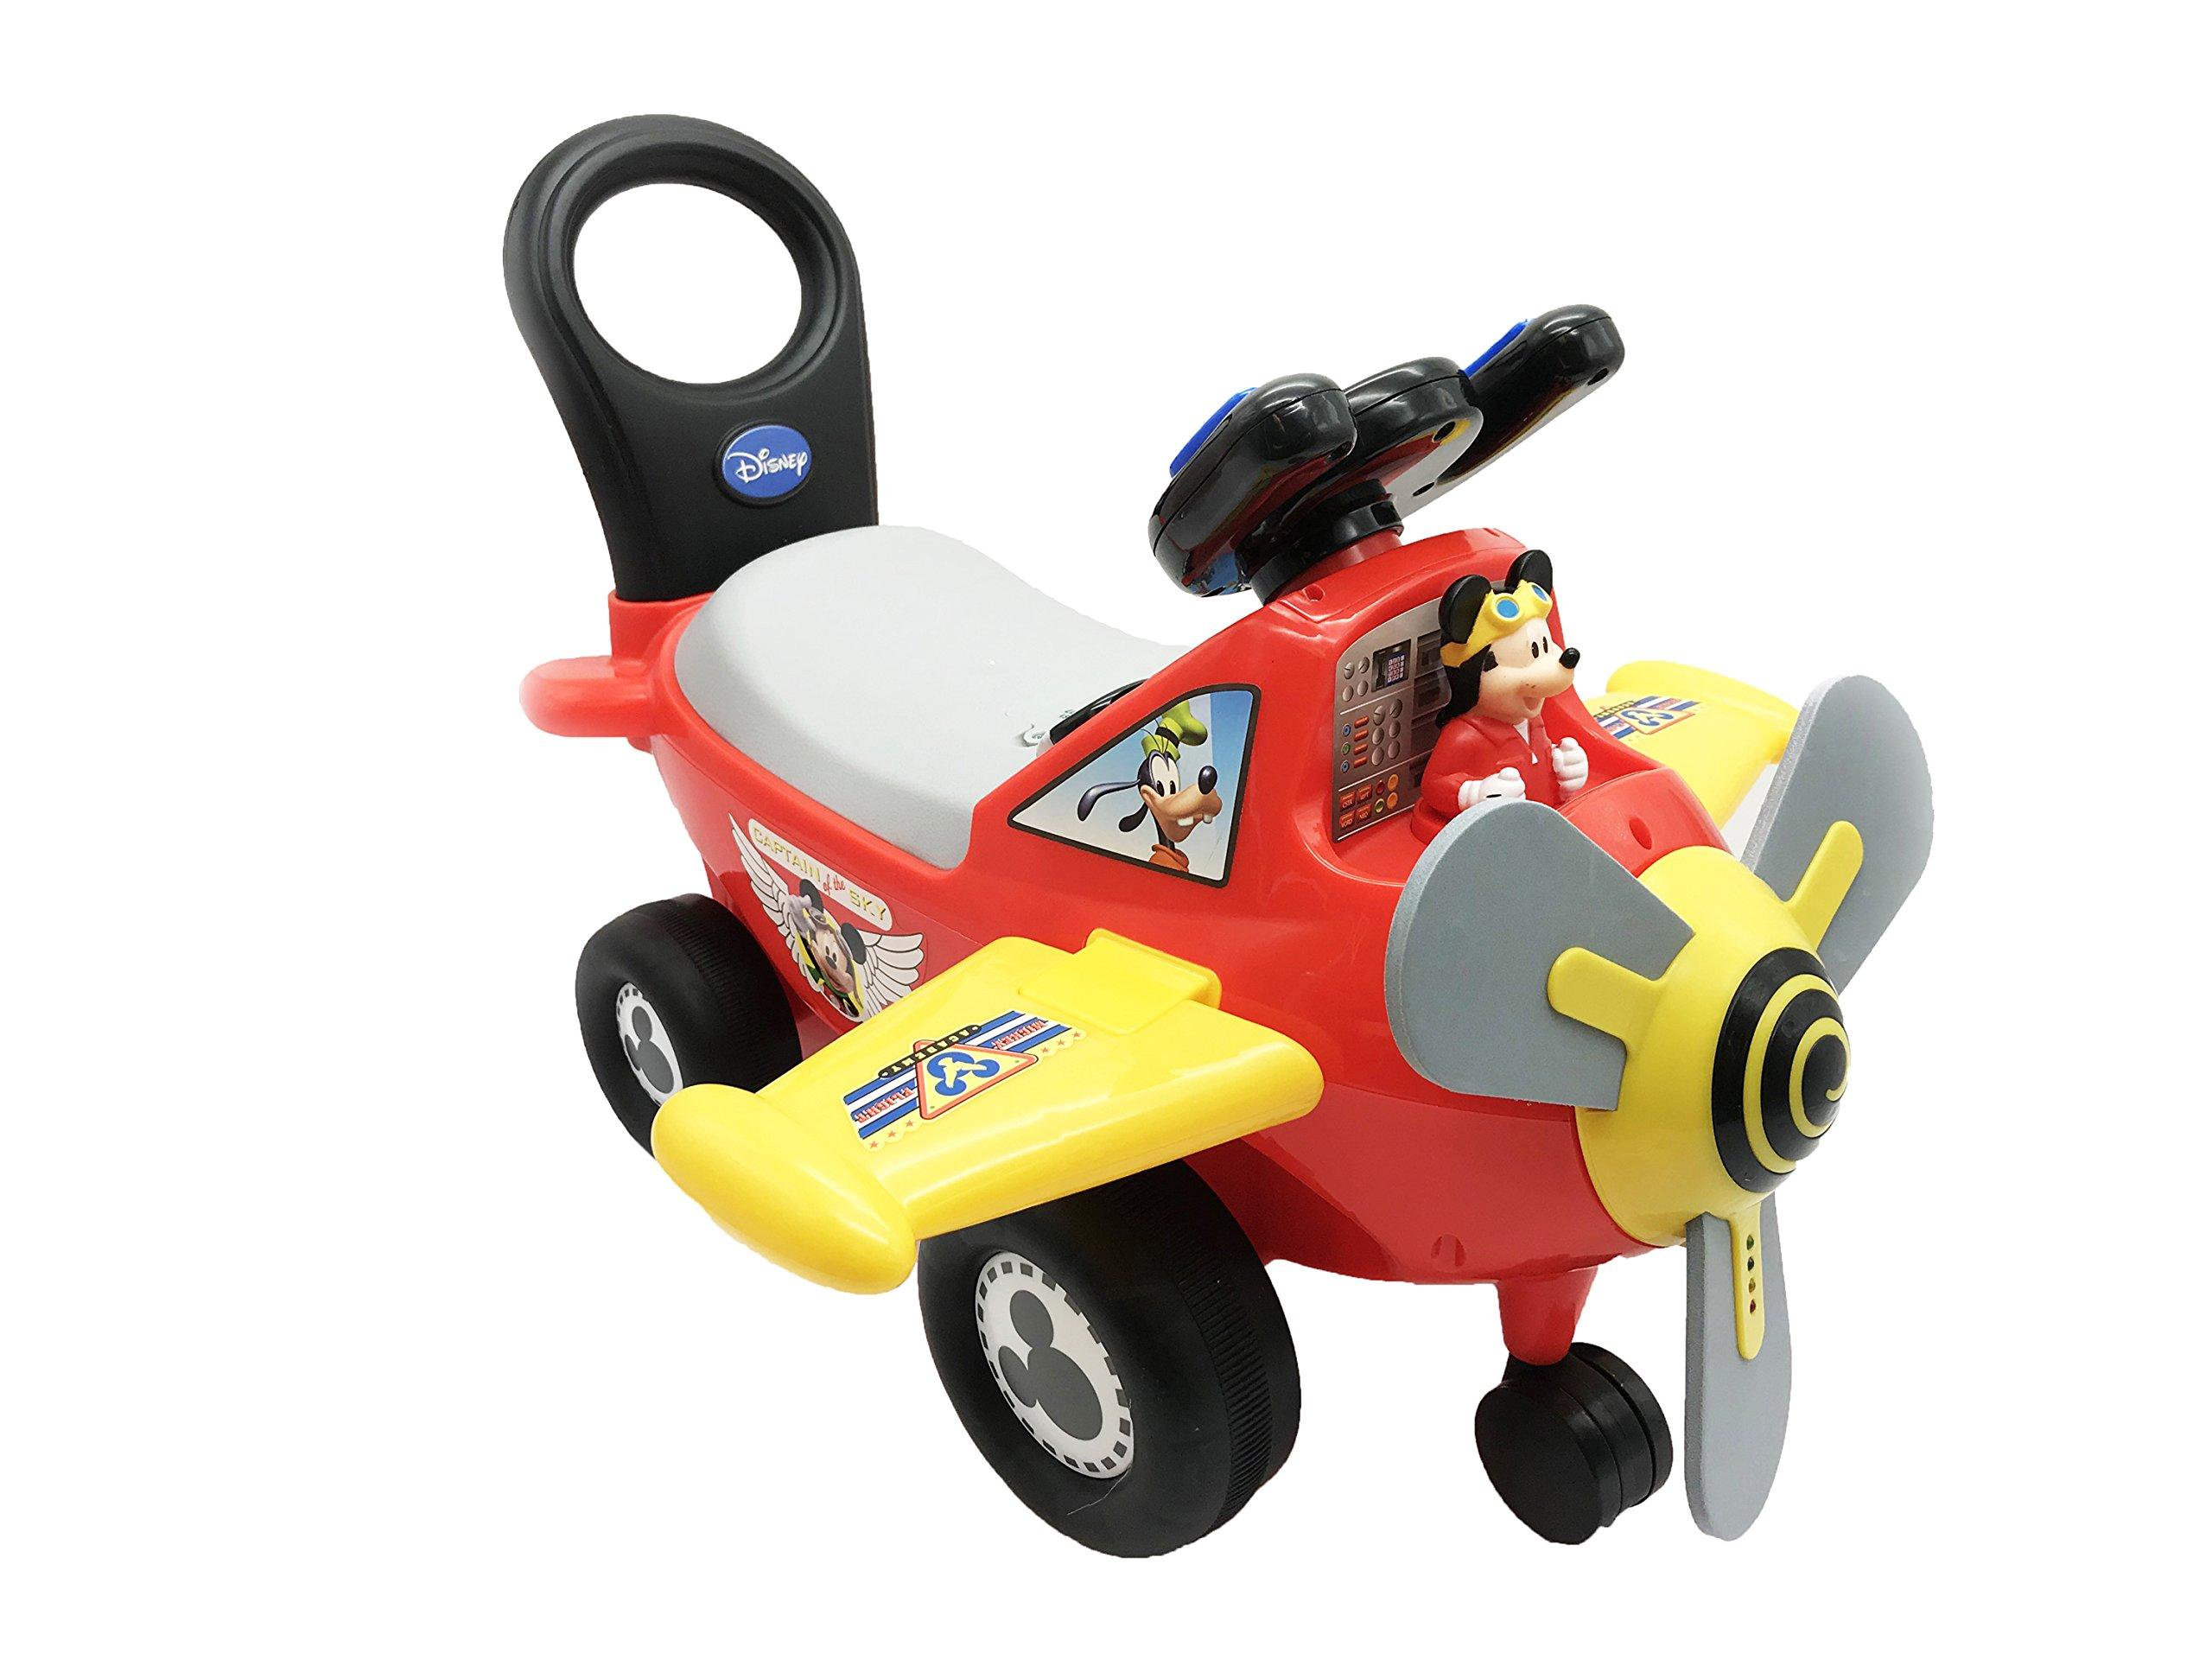 Kiddieland Disney Mickey Mouse Plane Light & Sound Activity Ride-On by Kiddieland Toys Limited